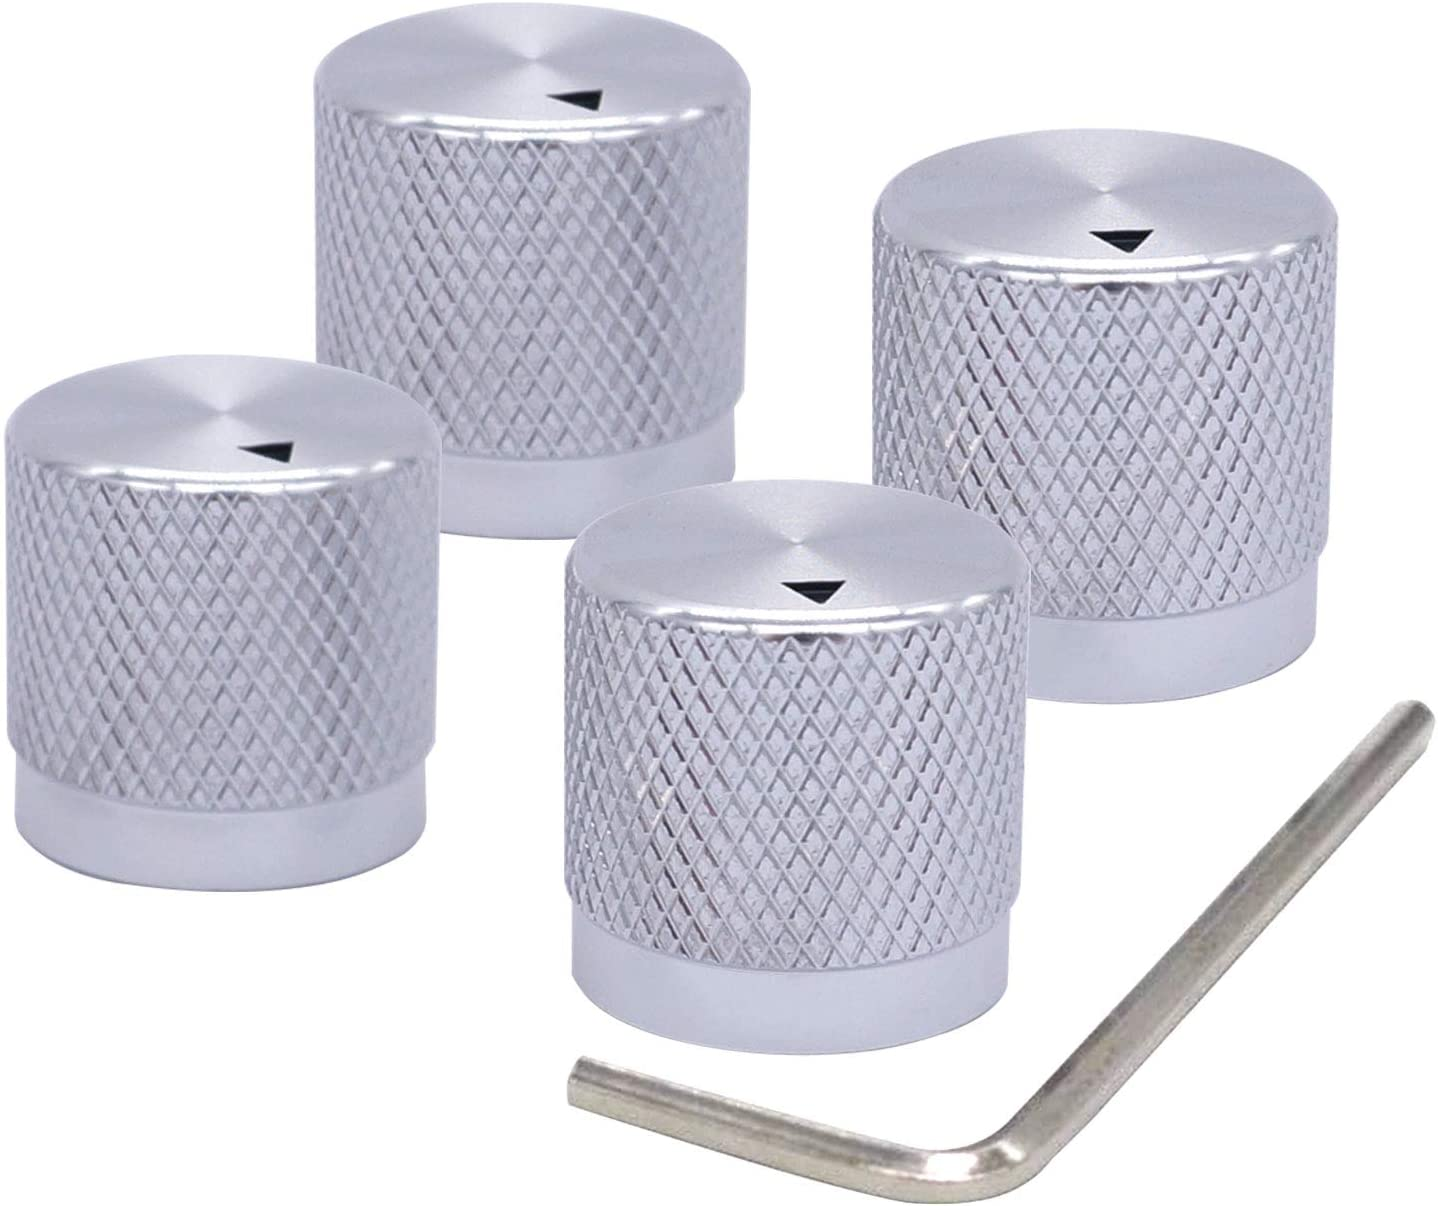 Taiss Milwaukee Mall 4pcs Silver Color Miami Mall Aluminum Pote Electronic Control Rotary